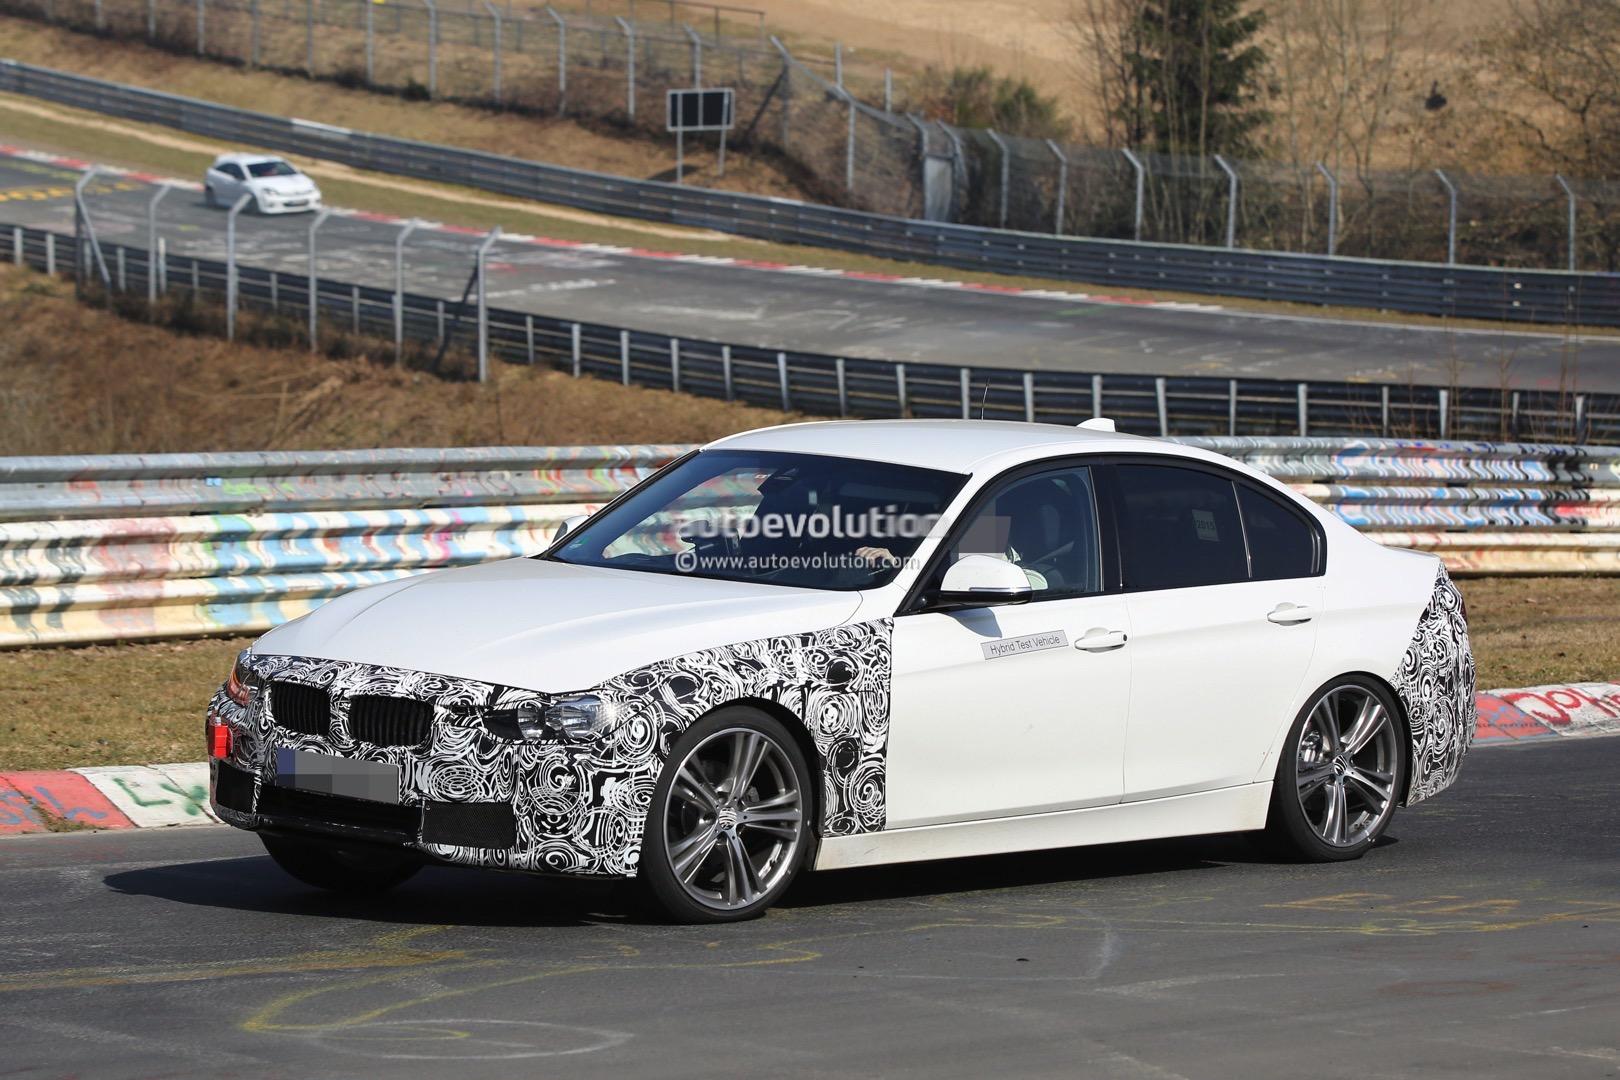 2016 Bmw F30 3 Series Facelift Plug In Hybrid Starts Nurburgring